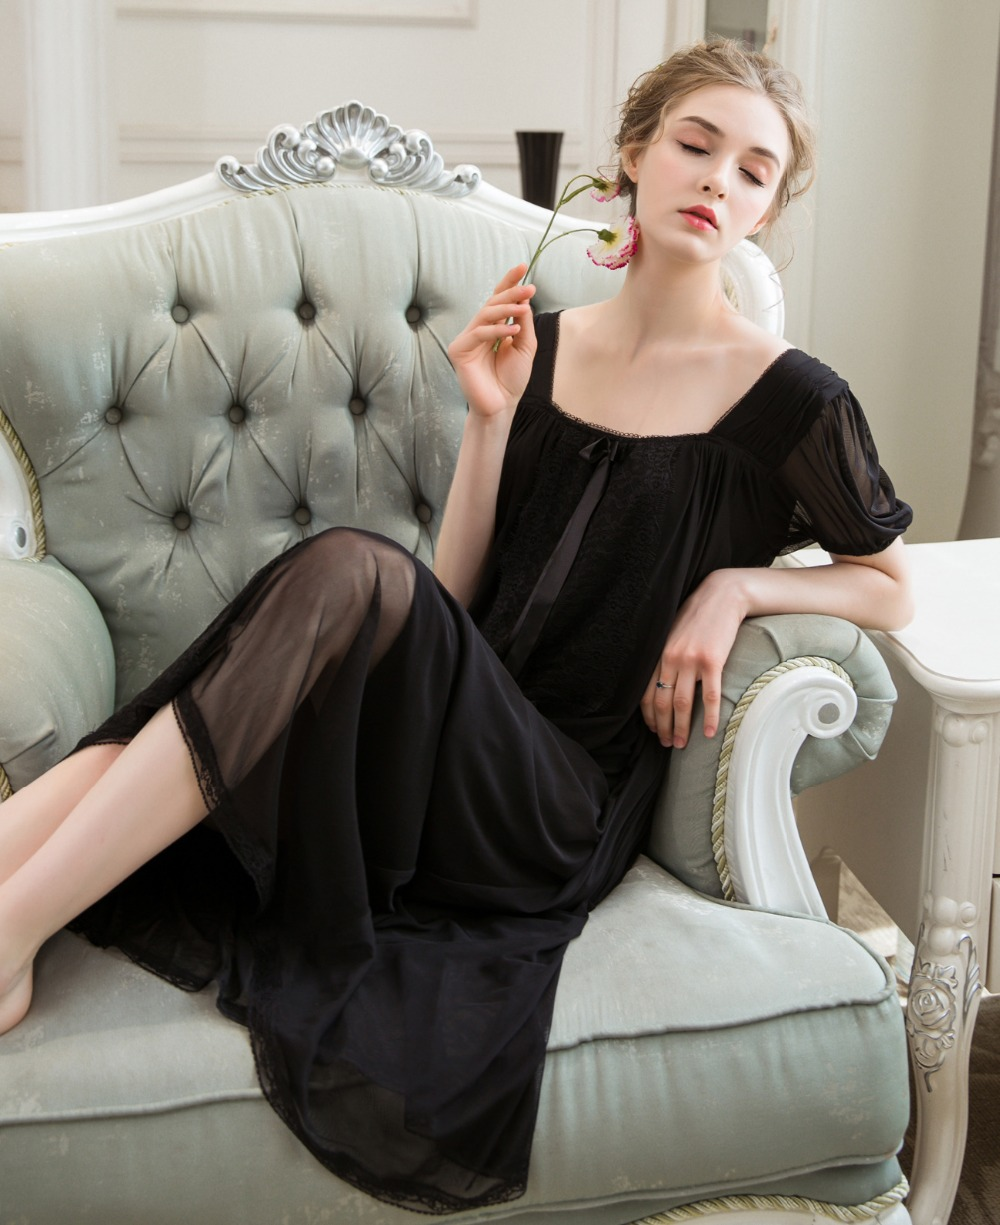 2018 New Black Multilayered Lace Nightwear Women   Nightgowns     Sleepshirts   Ladies Nightdress Sleepwear Garden Beach Dress 0290#